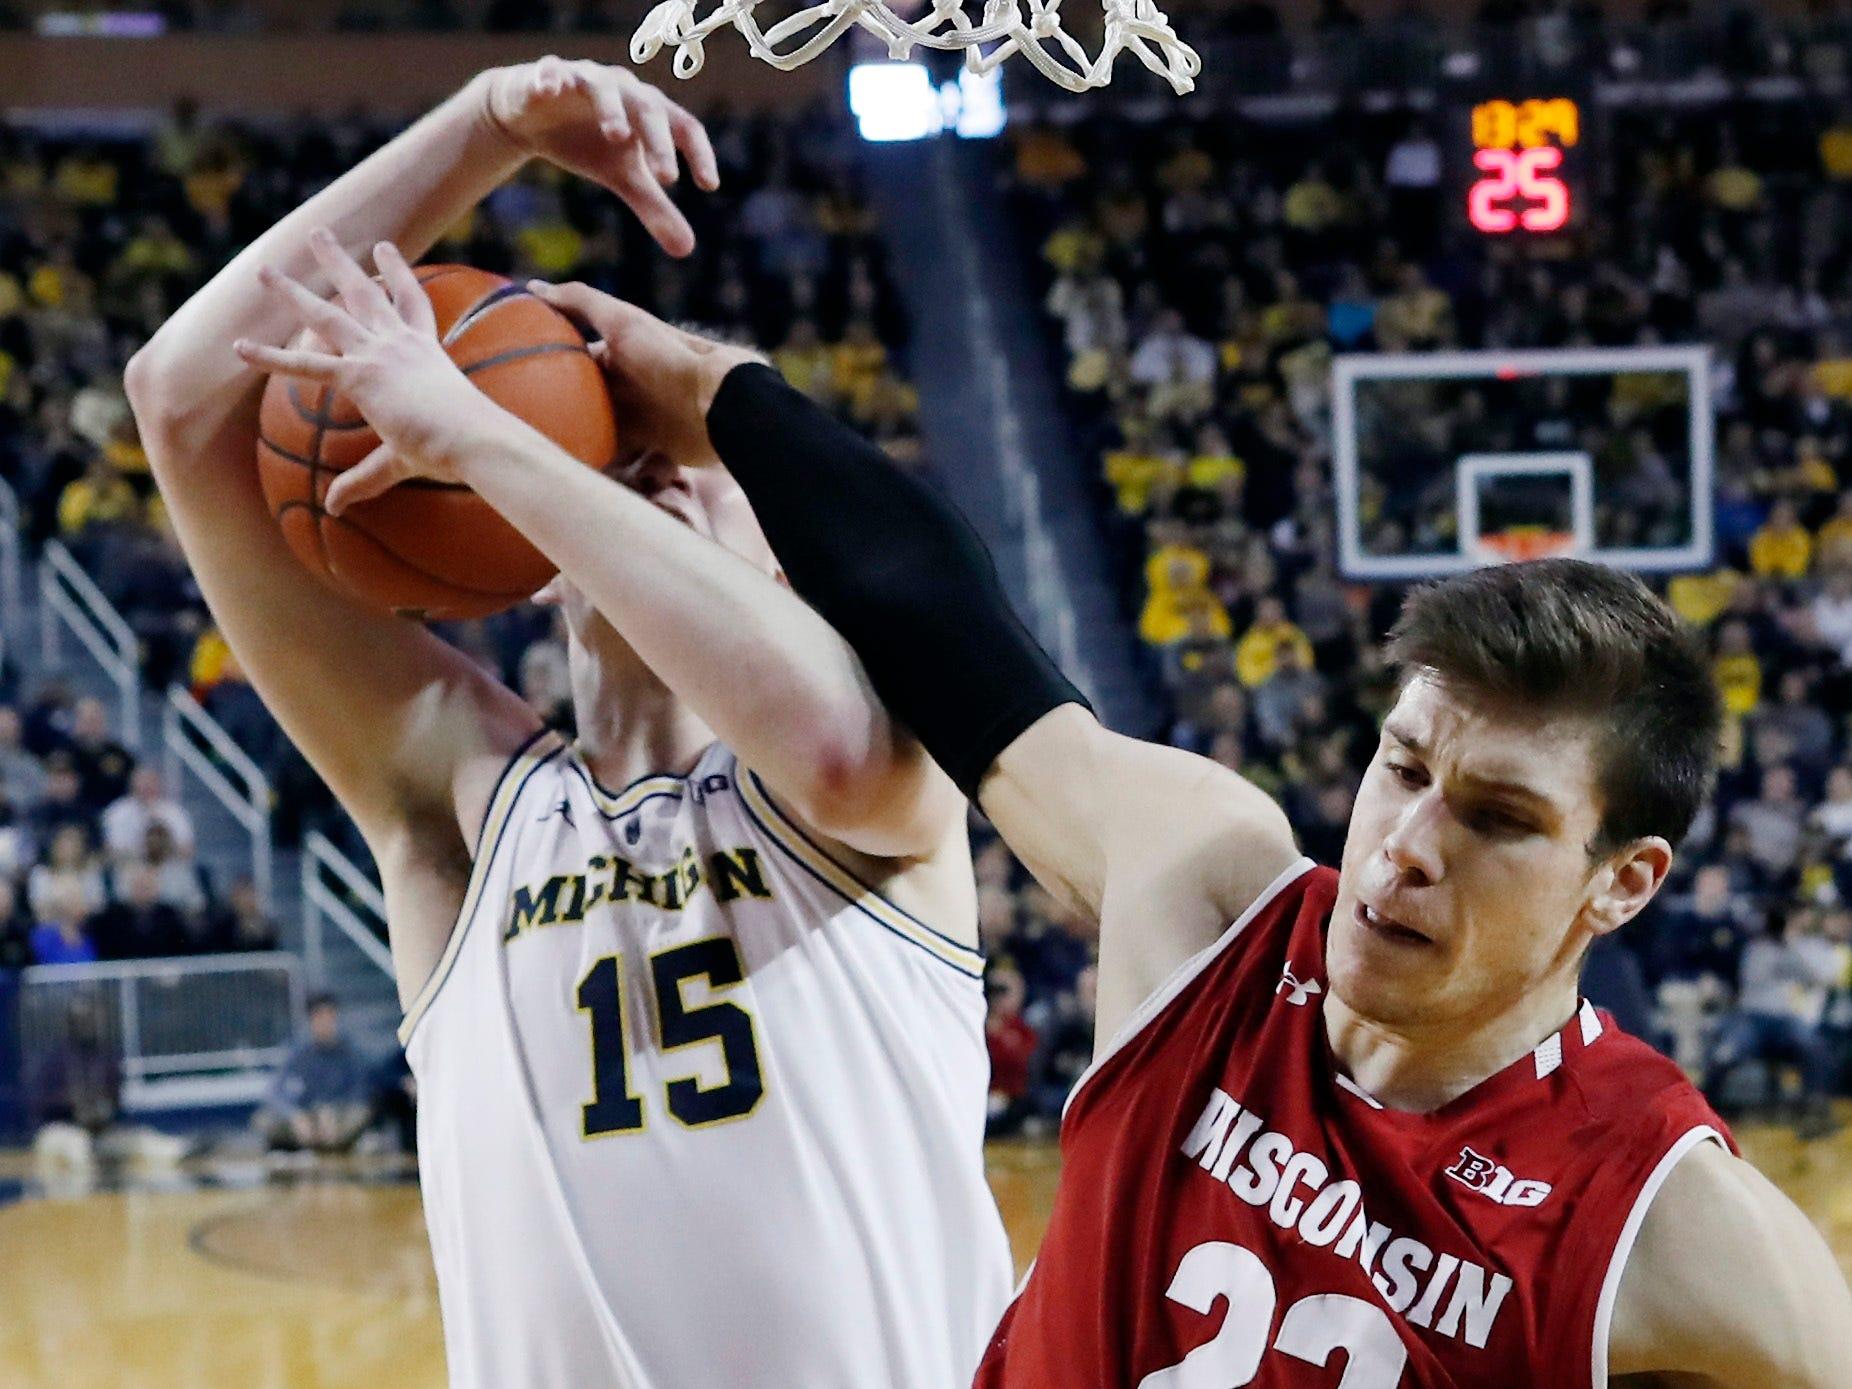 Wisconsin forward Ethan Happ knocks the ball away from Michigan center Jon Teske.